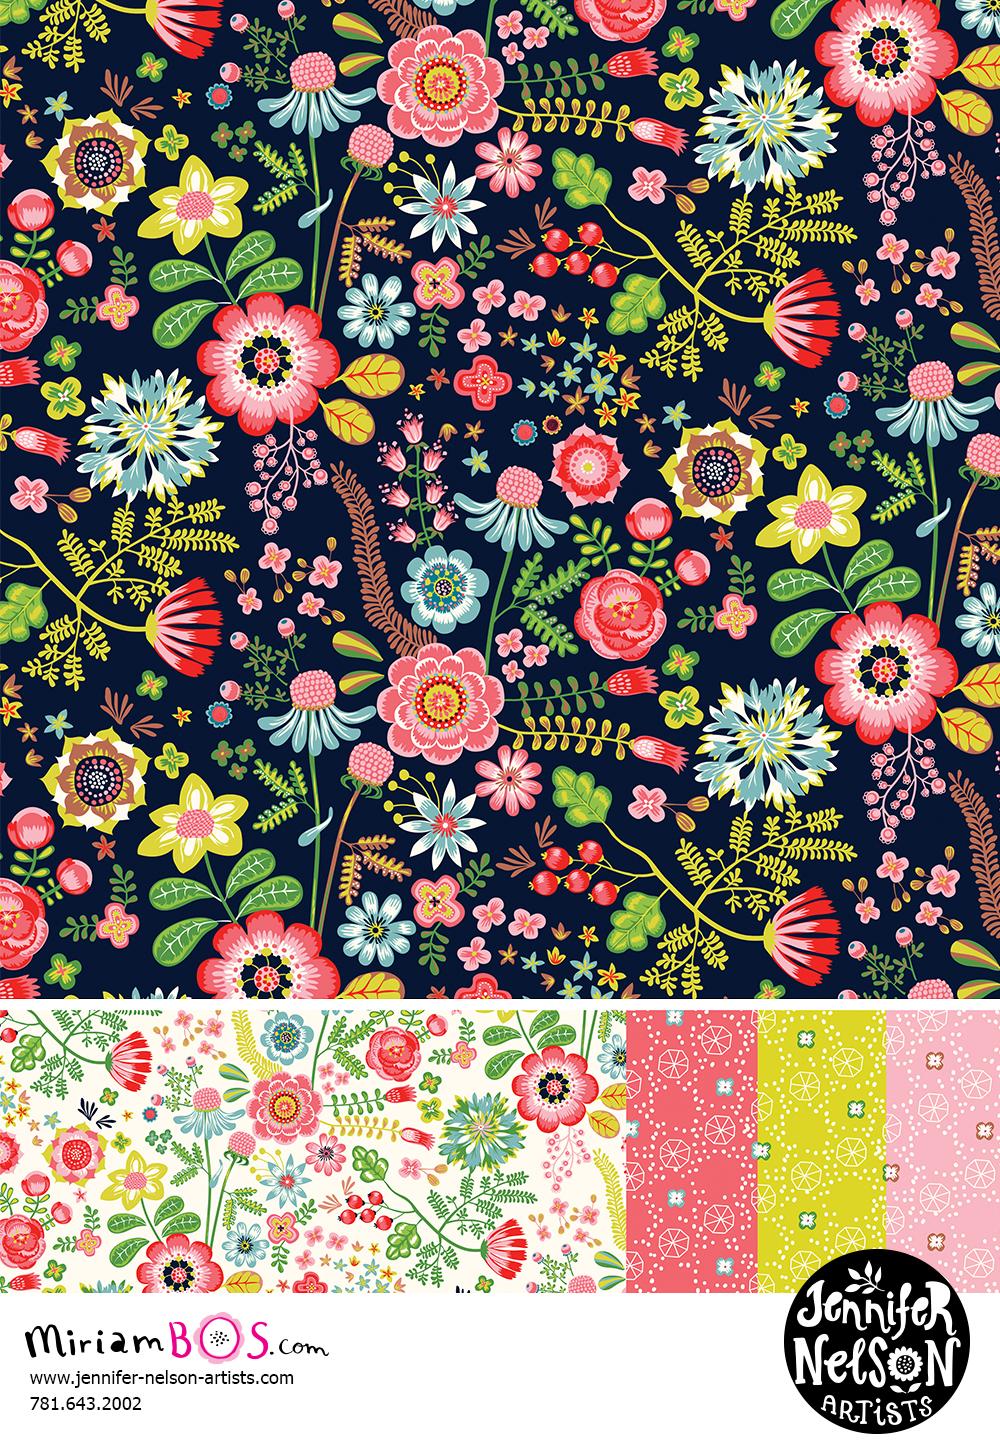 MiriamBos_web-repeat-FLO-flowergarden.jpg